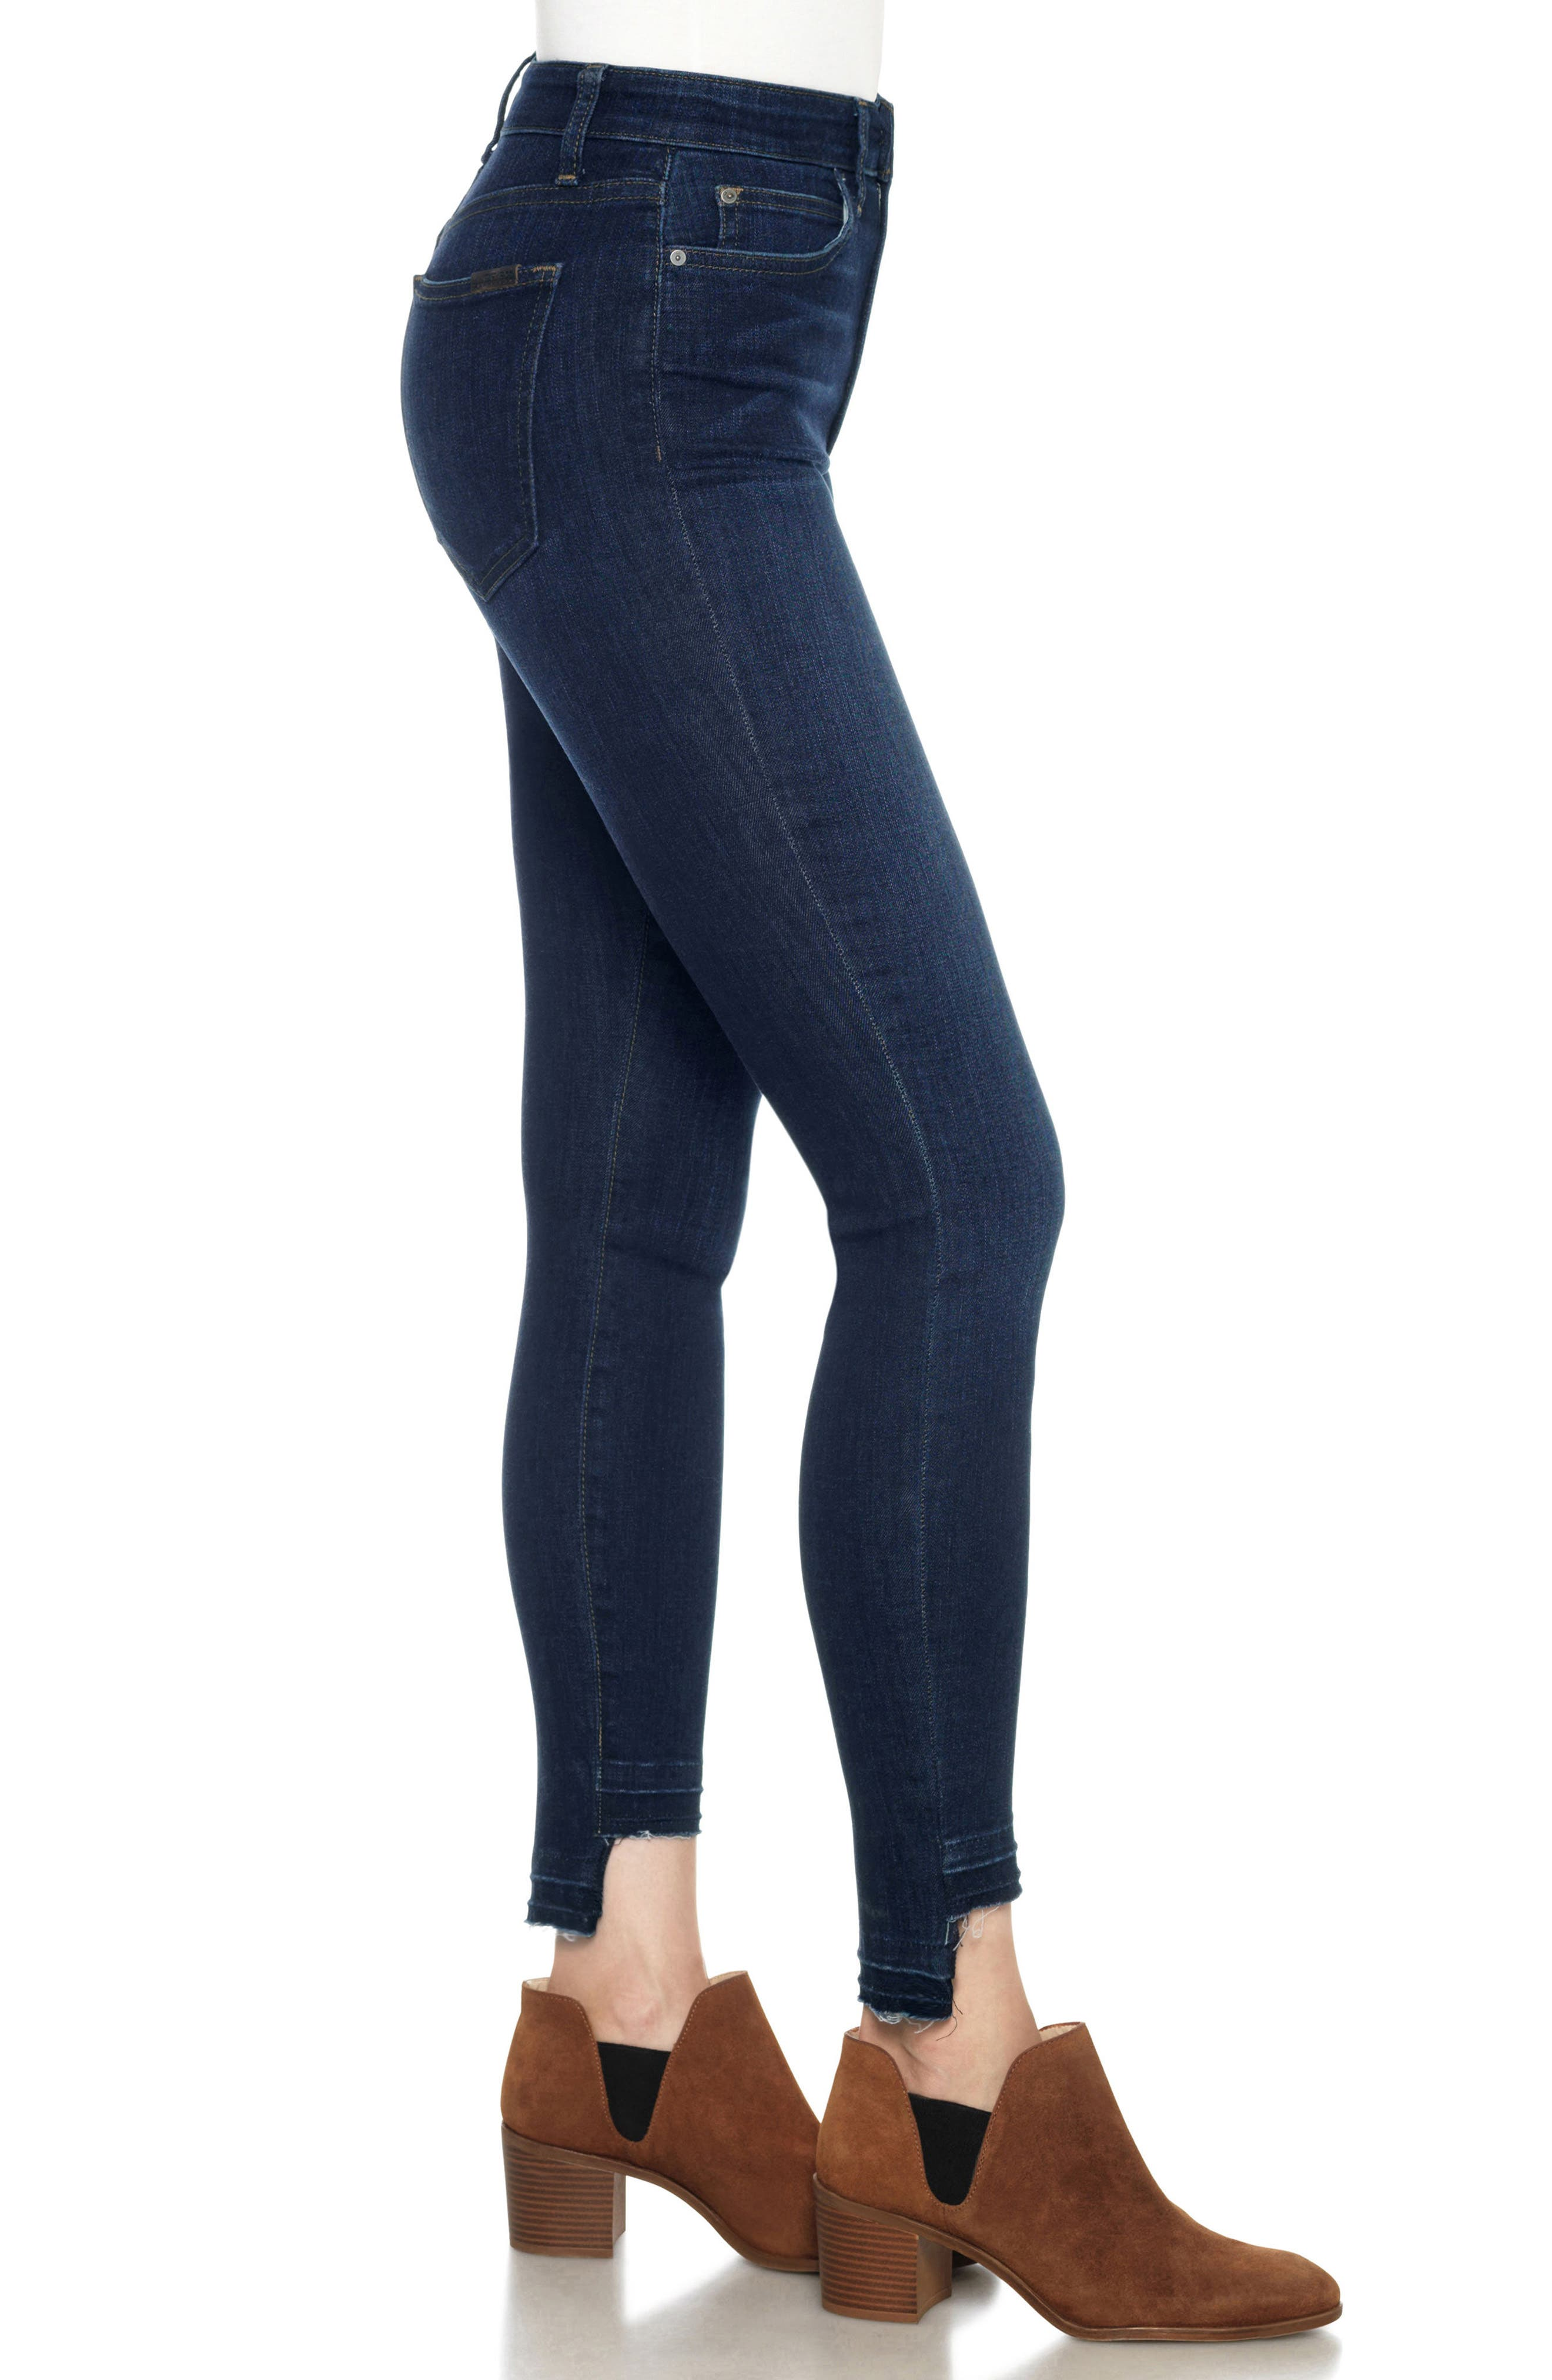 Alternate Image 3  - Joe's Flawless - Charlie High Waist Step Hem Ankle Skinny Jeans (Nurie)